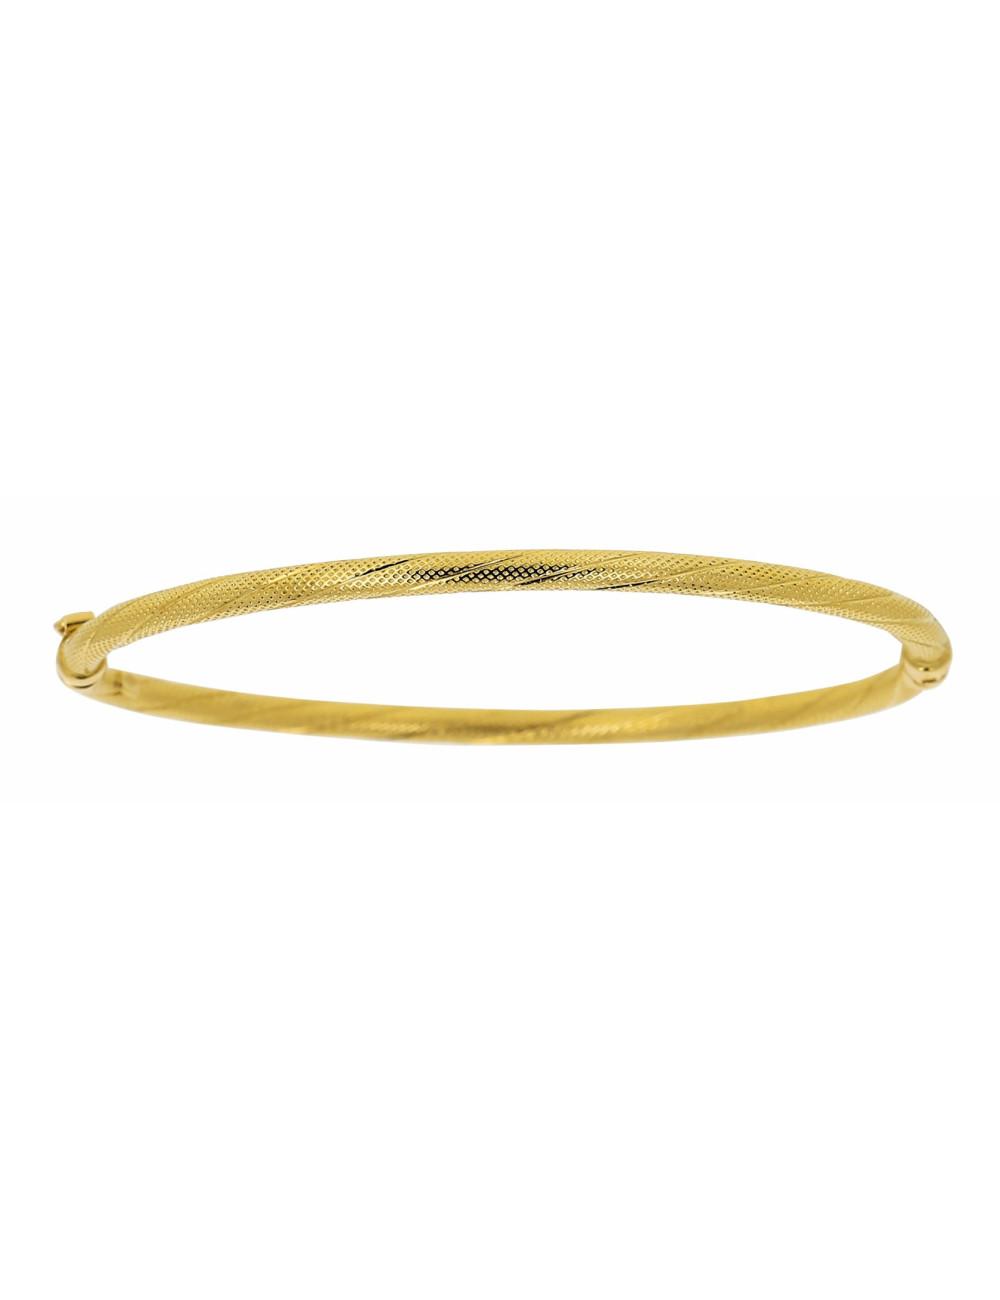 Bracelet Esclave Torsadée Satiné Brillant Or 18 carats